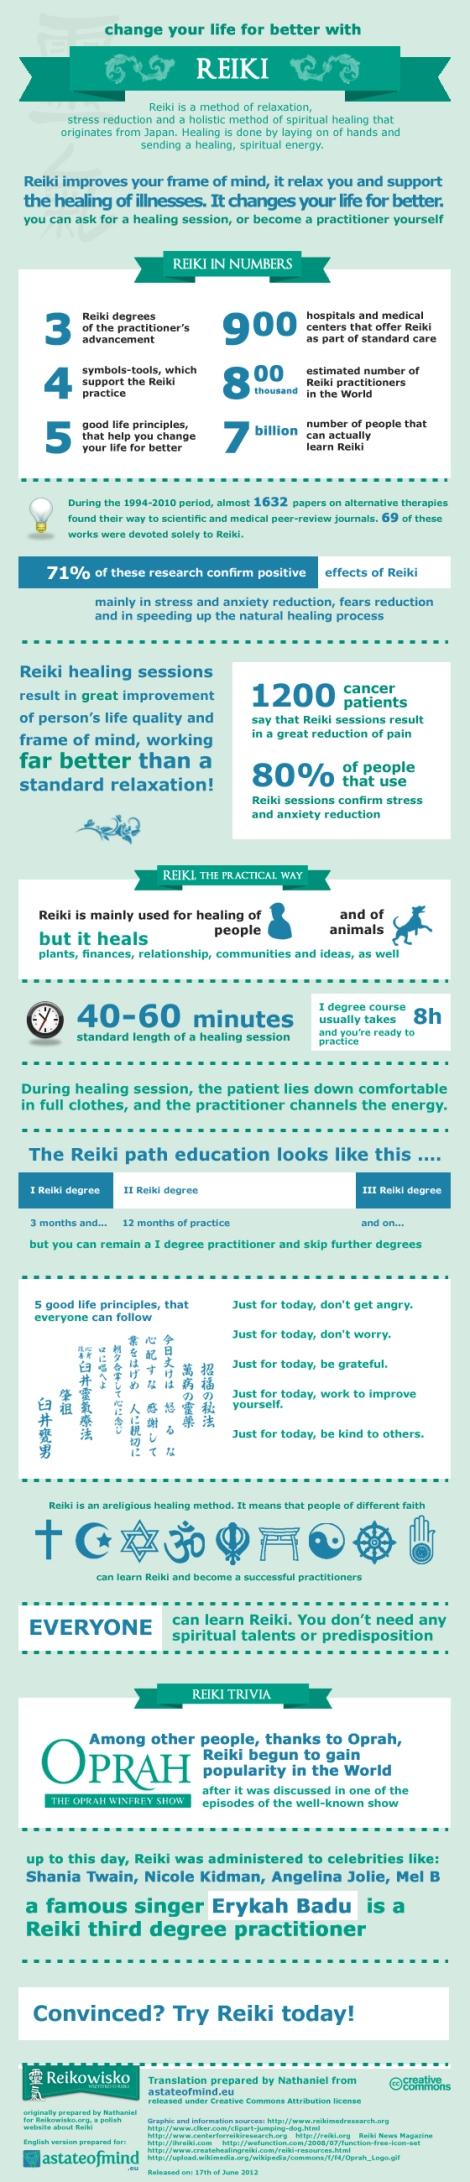 reiki-infographic